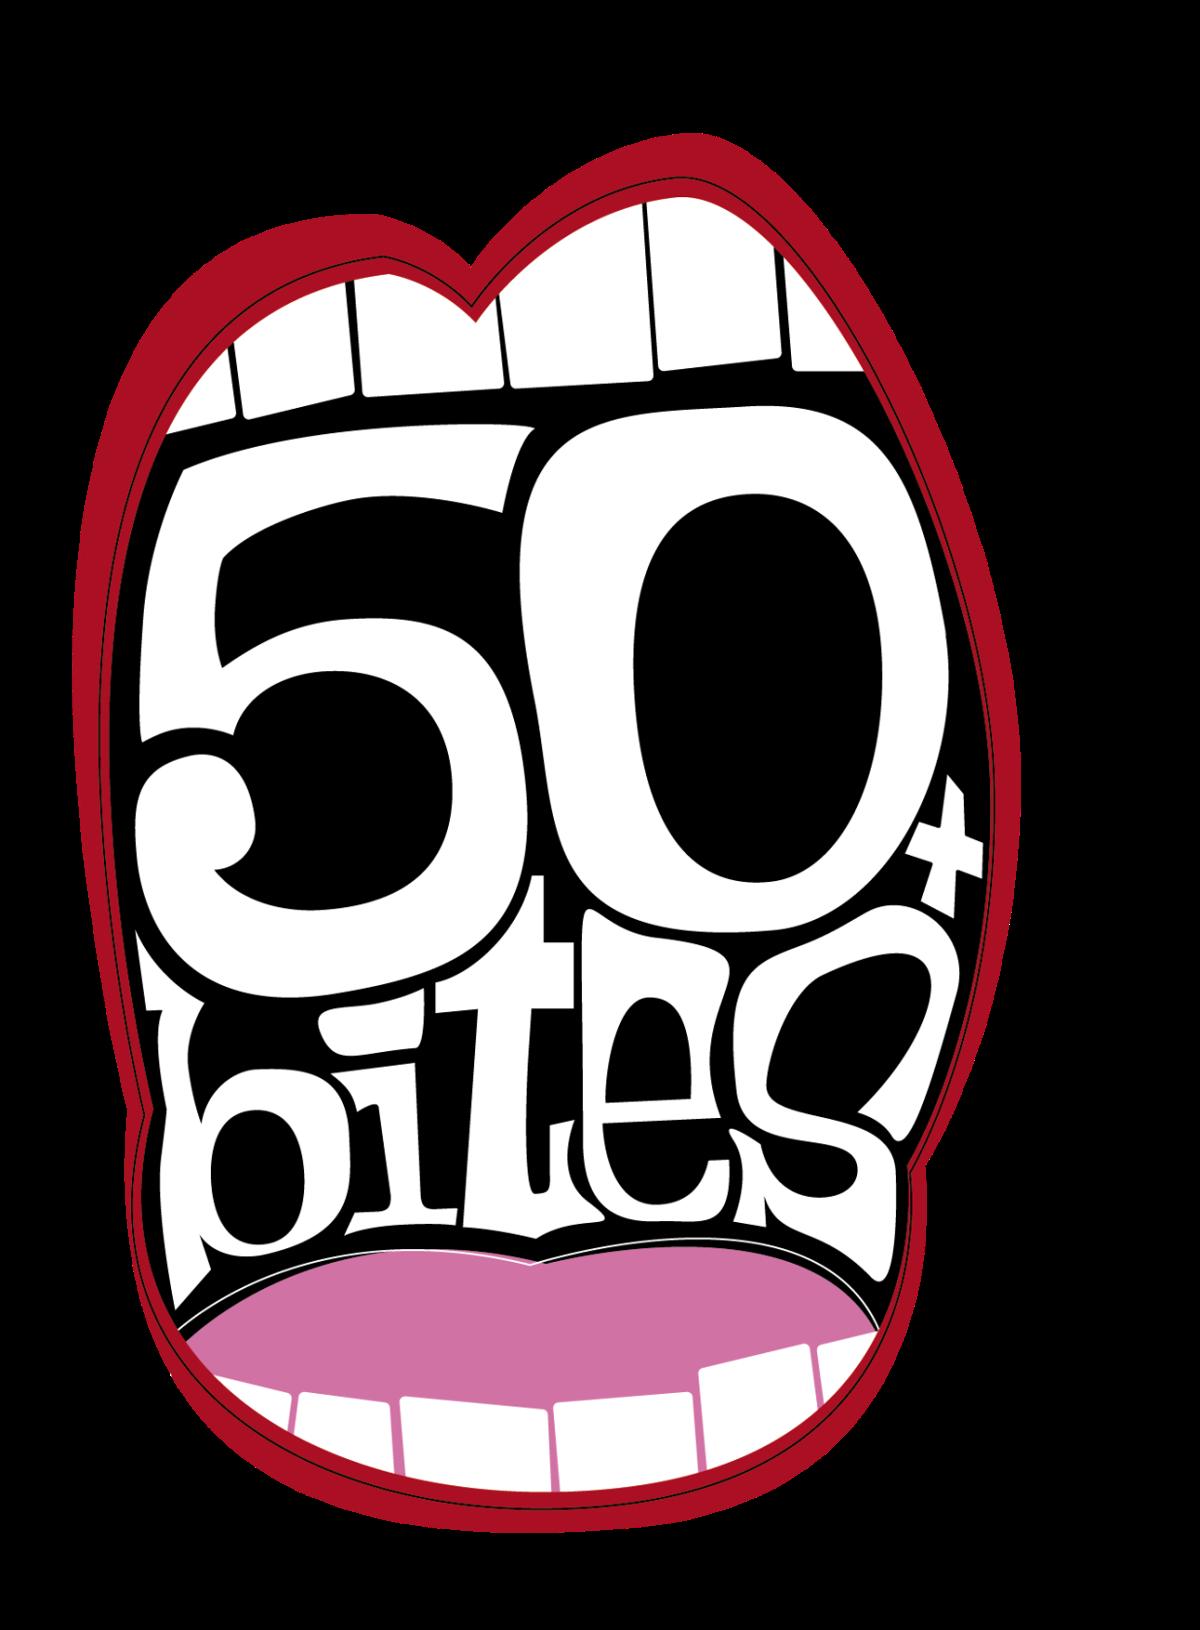 50 Bites+